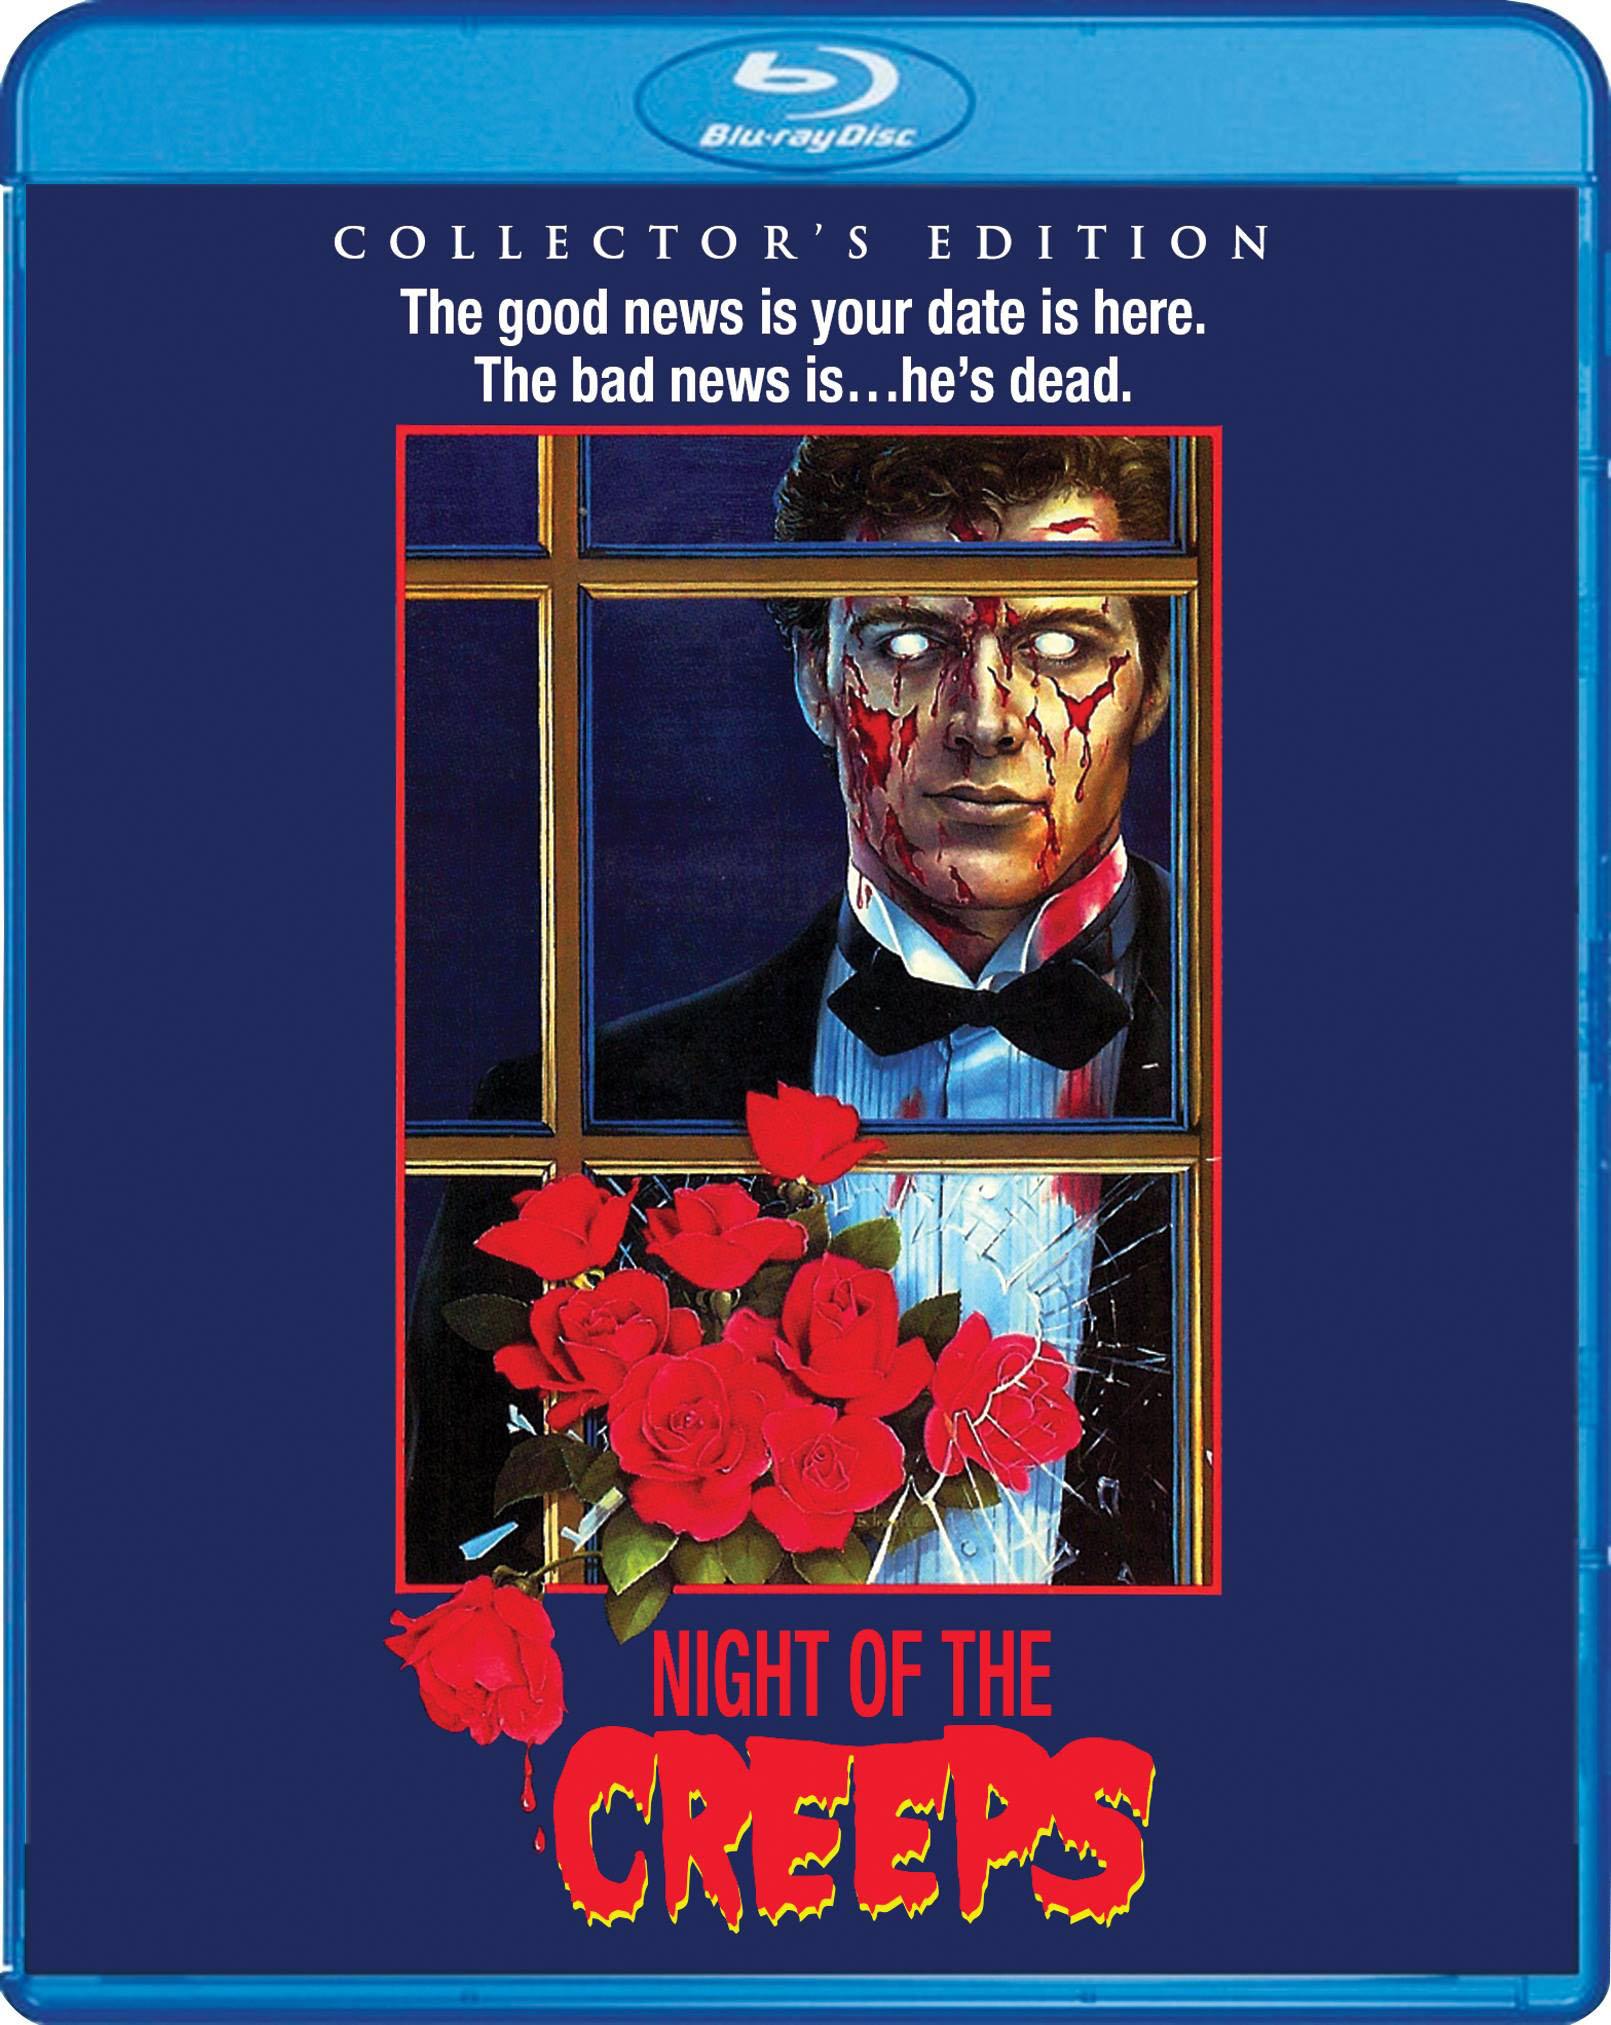 night of the creeps blu-ray